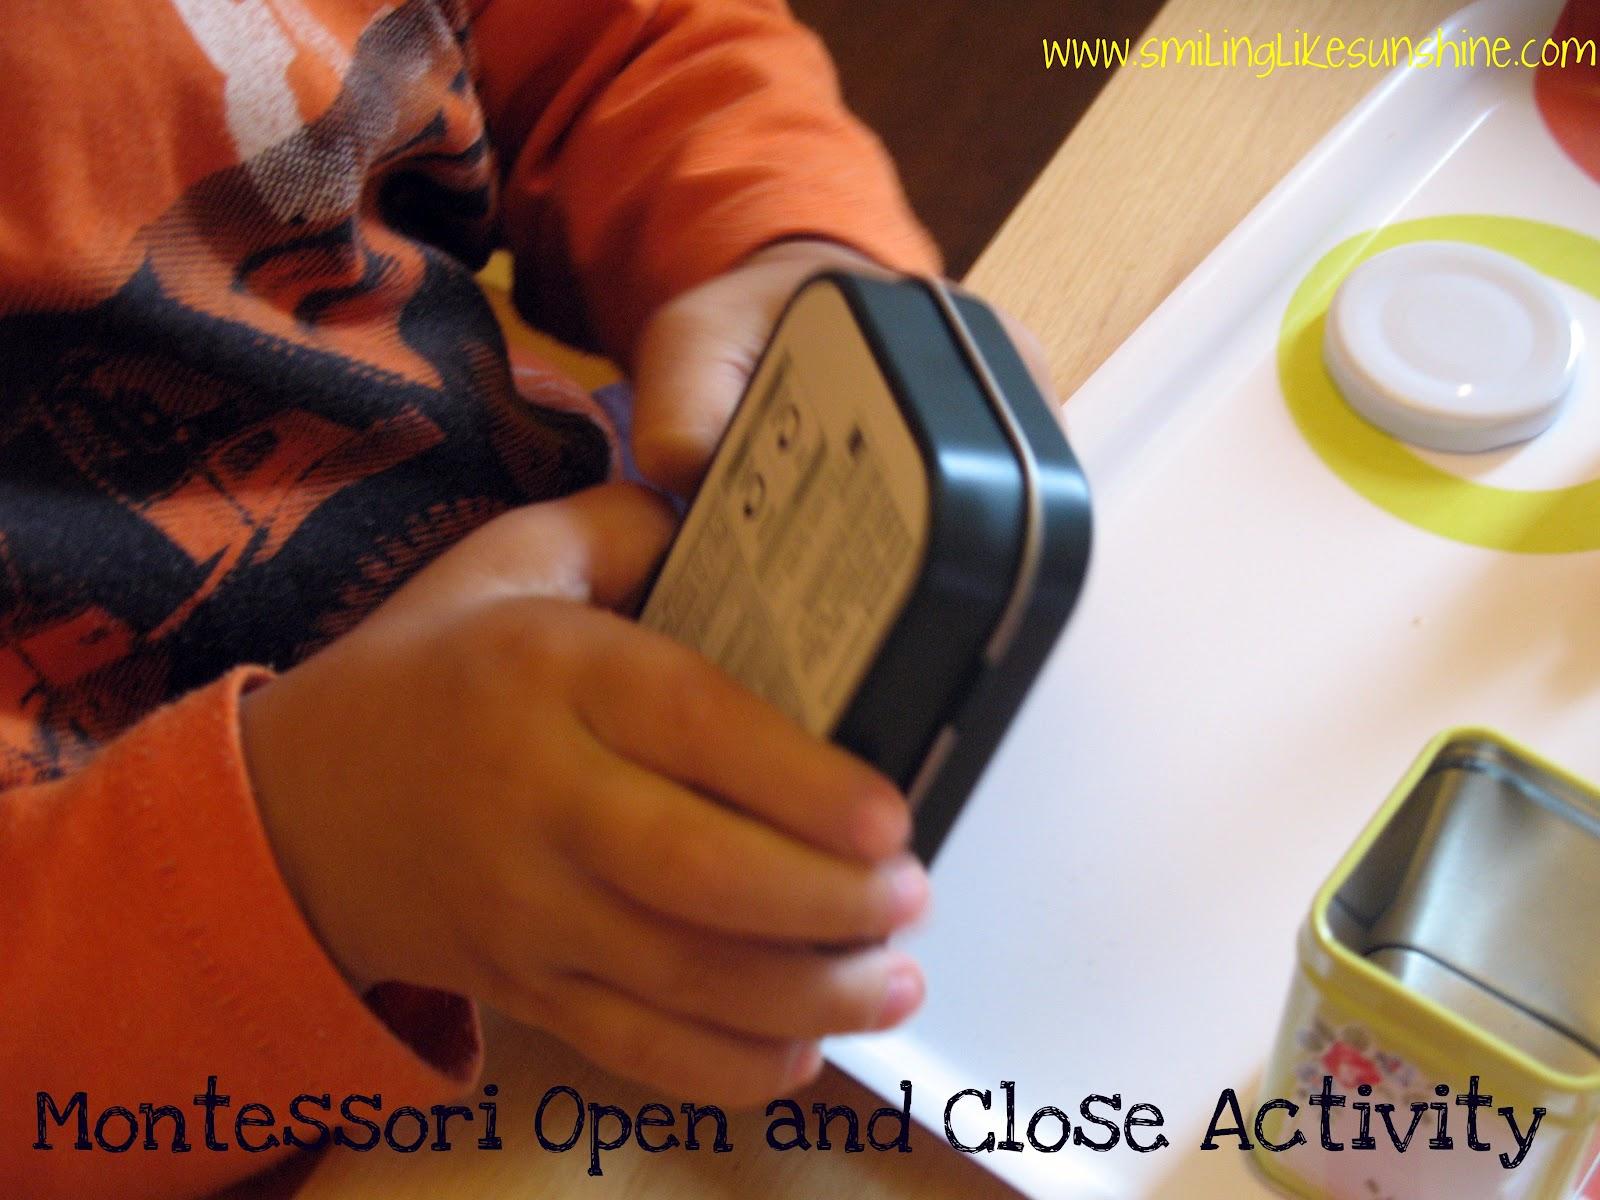 Smiling like sunshine montessori open and close activity for Montessori fine motor skills